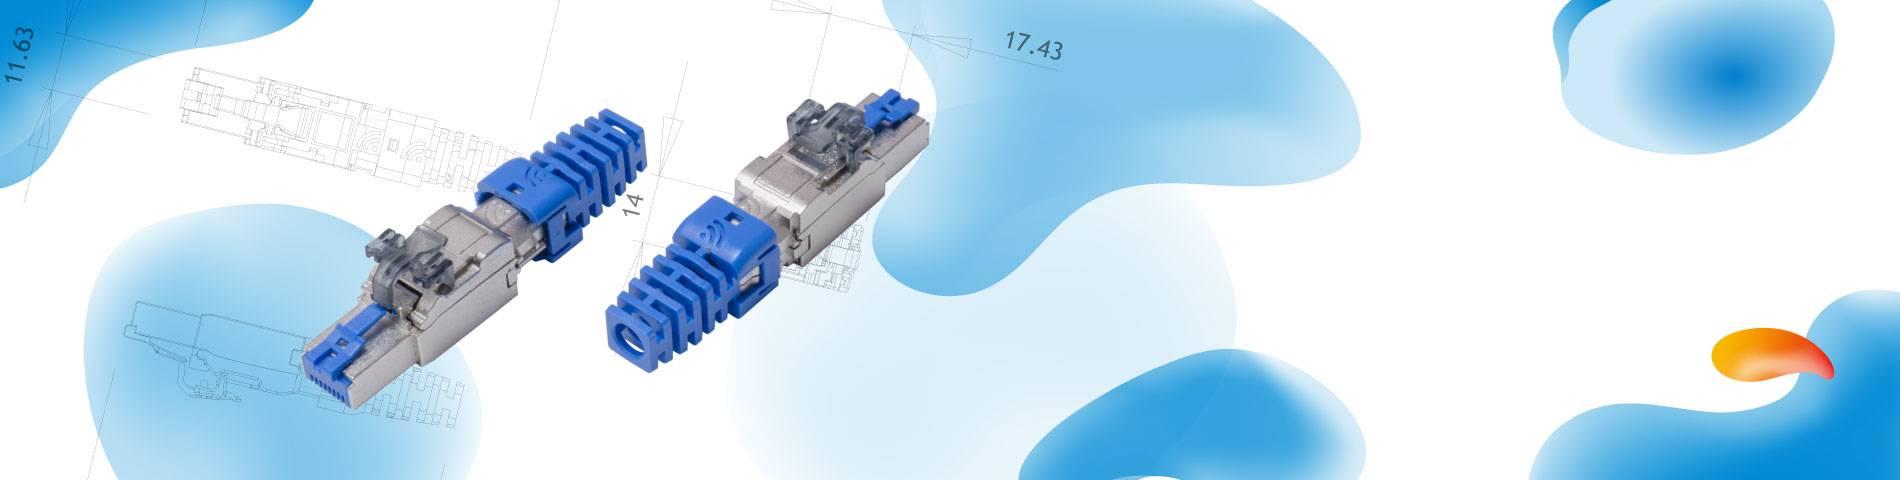 HCI    Feldabschlussstecker    ISO / IEC Cat6A PoE +